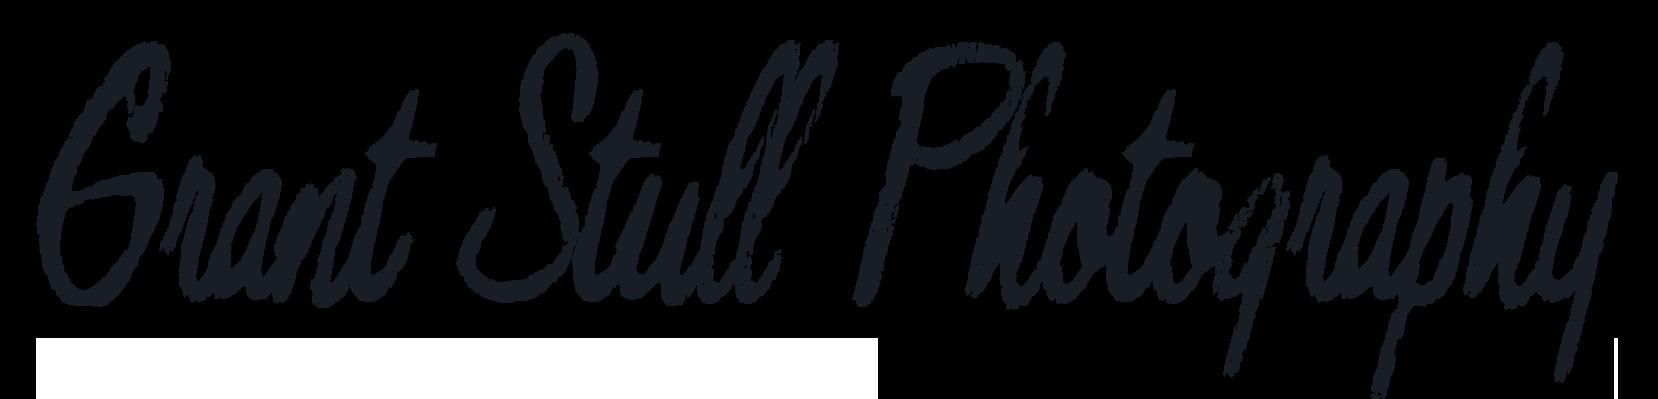 Grant Stull Photography